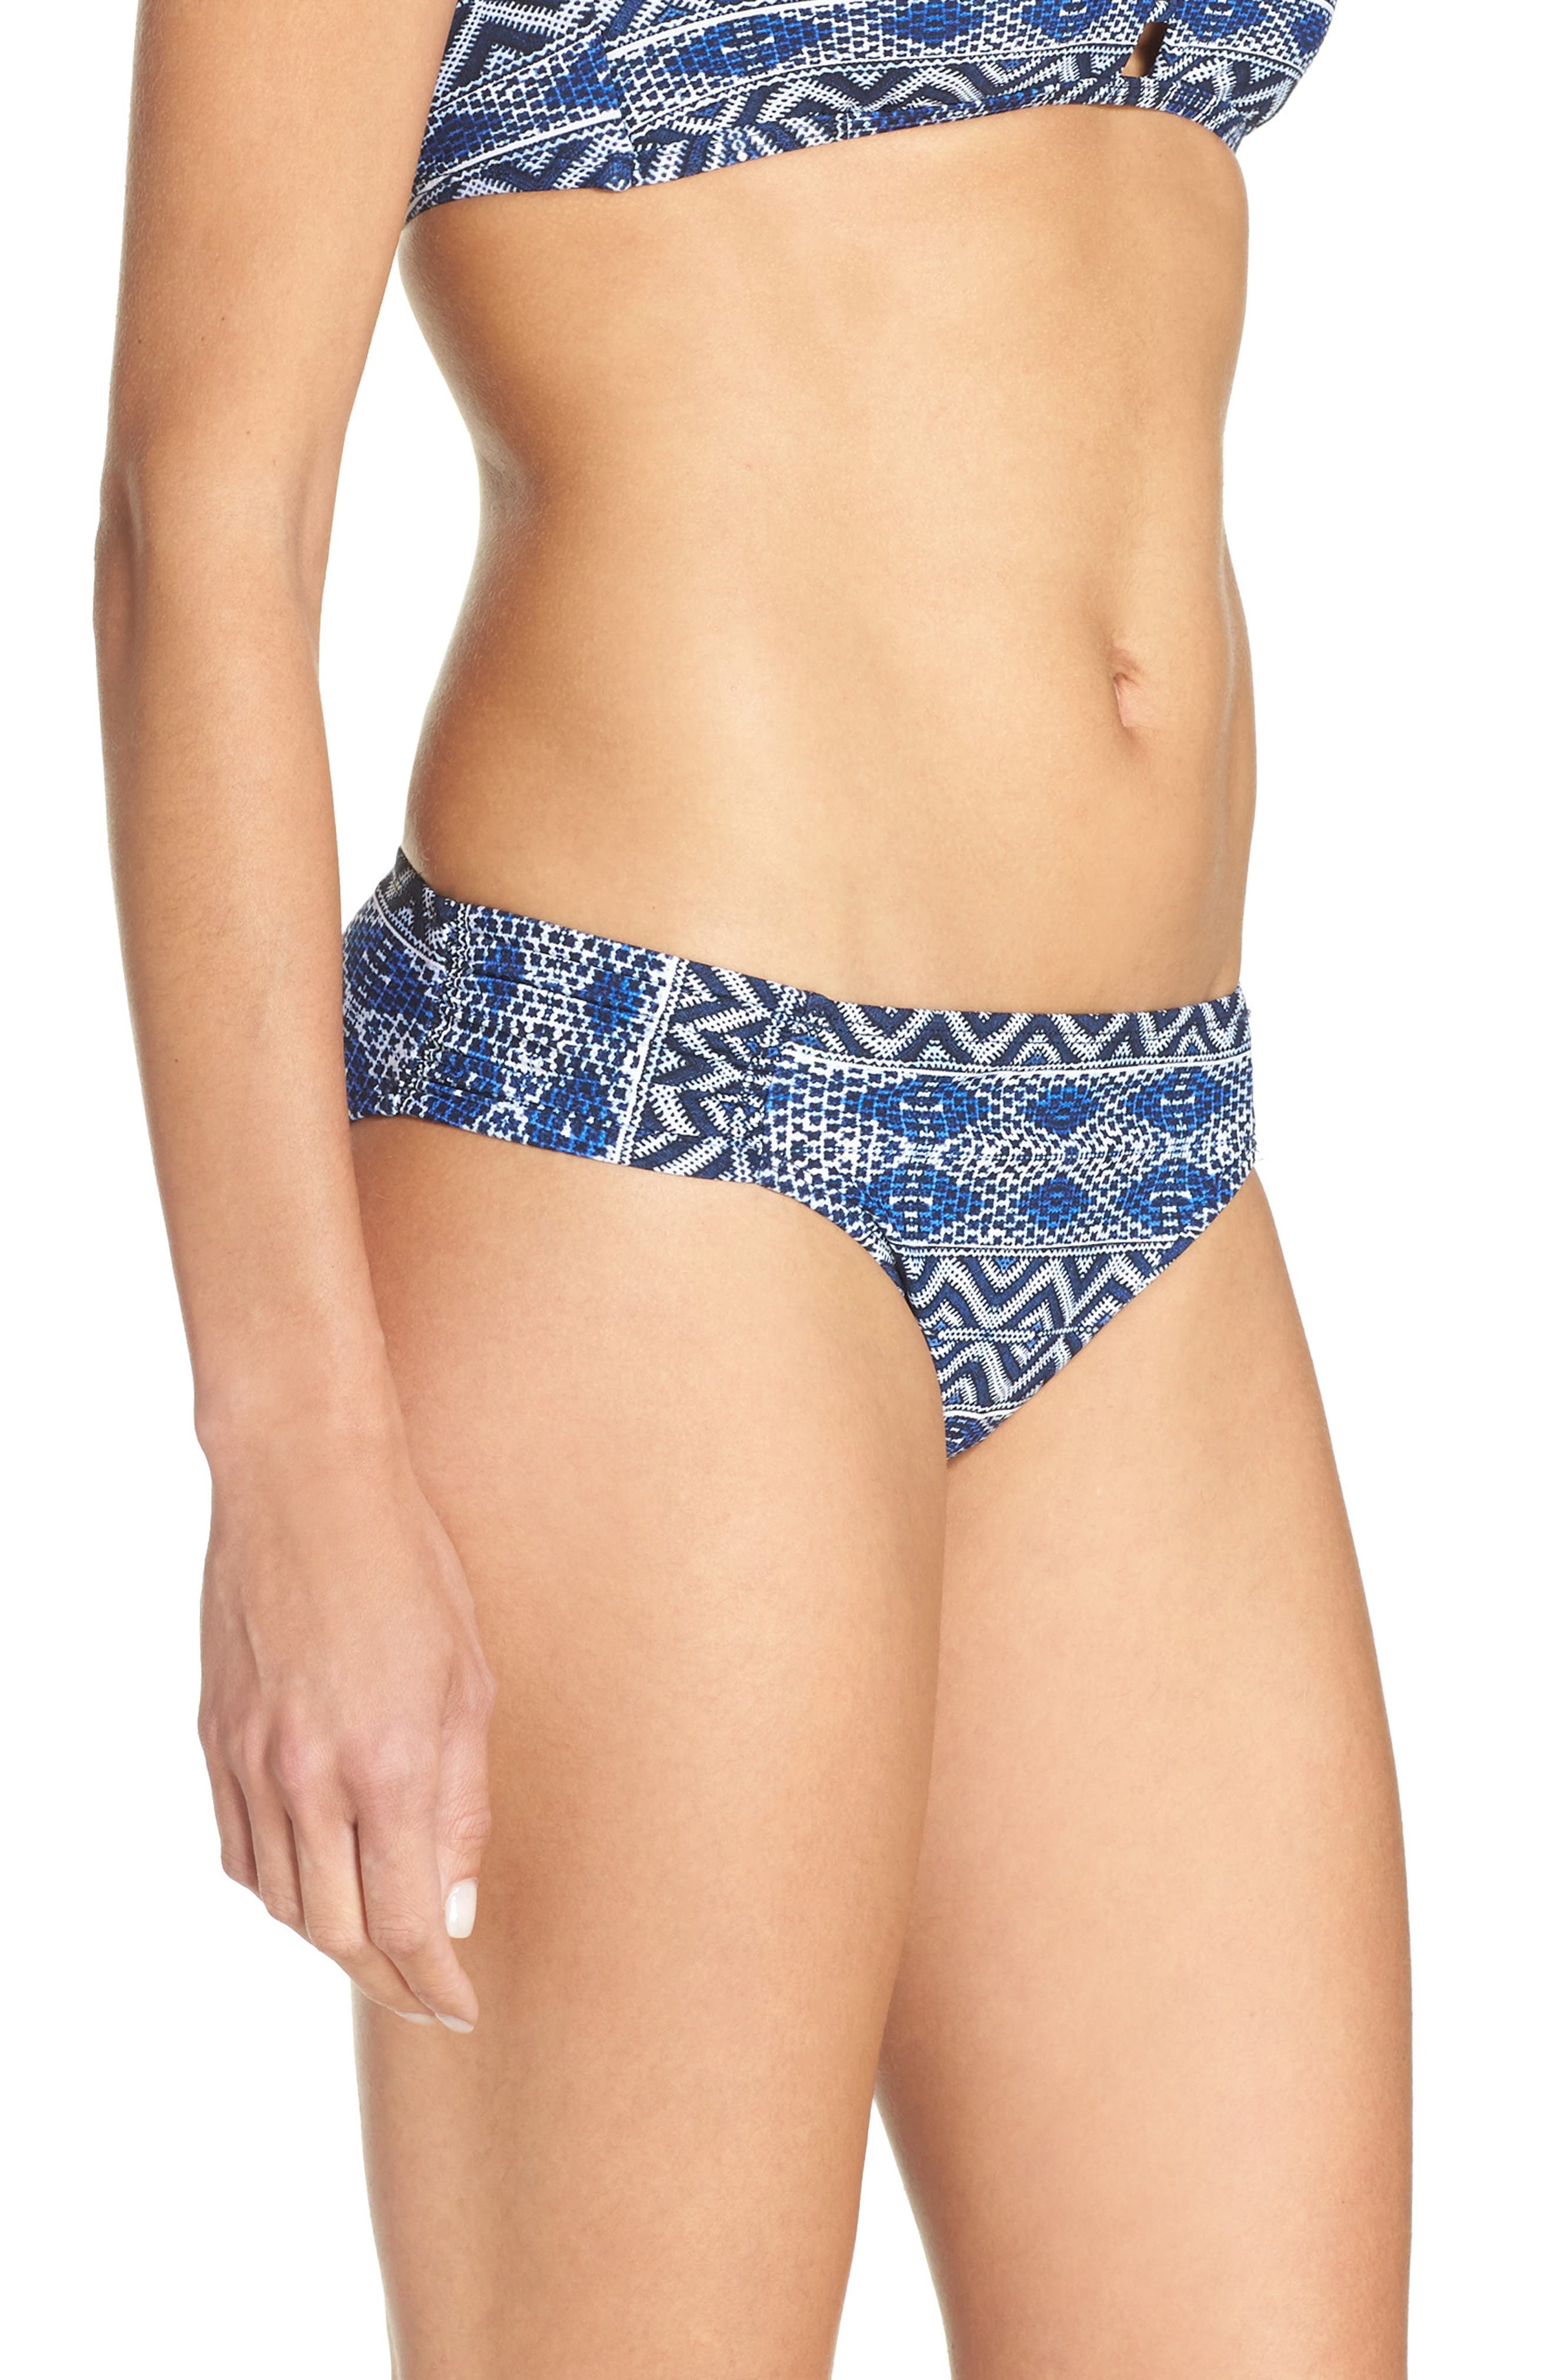 Alternate Image 3  - La Blanca Designer Jeans Hipster Bikini Bottoms